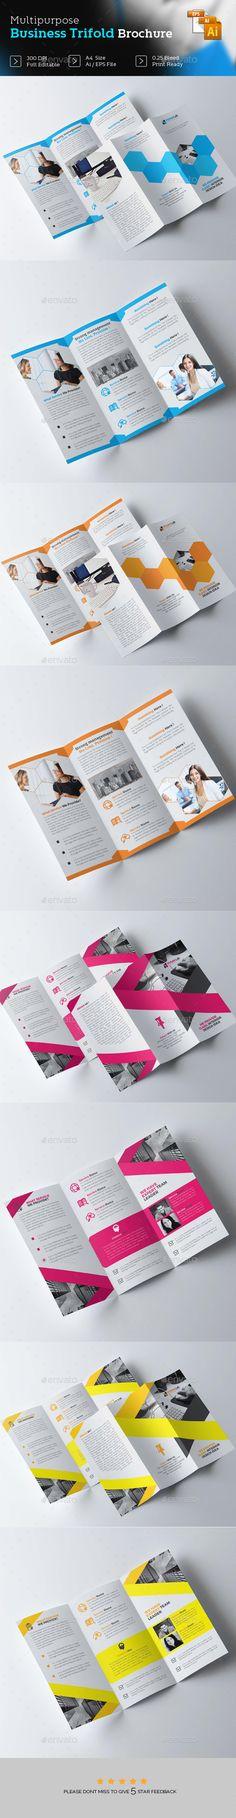 Business Trifold Brochure Design Templates Vector EPS, AI Illustrator Bundle